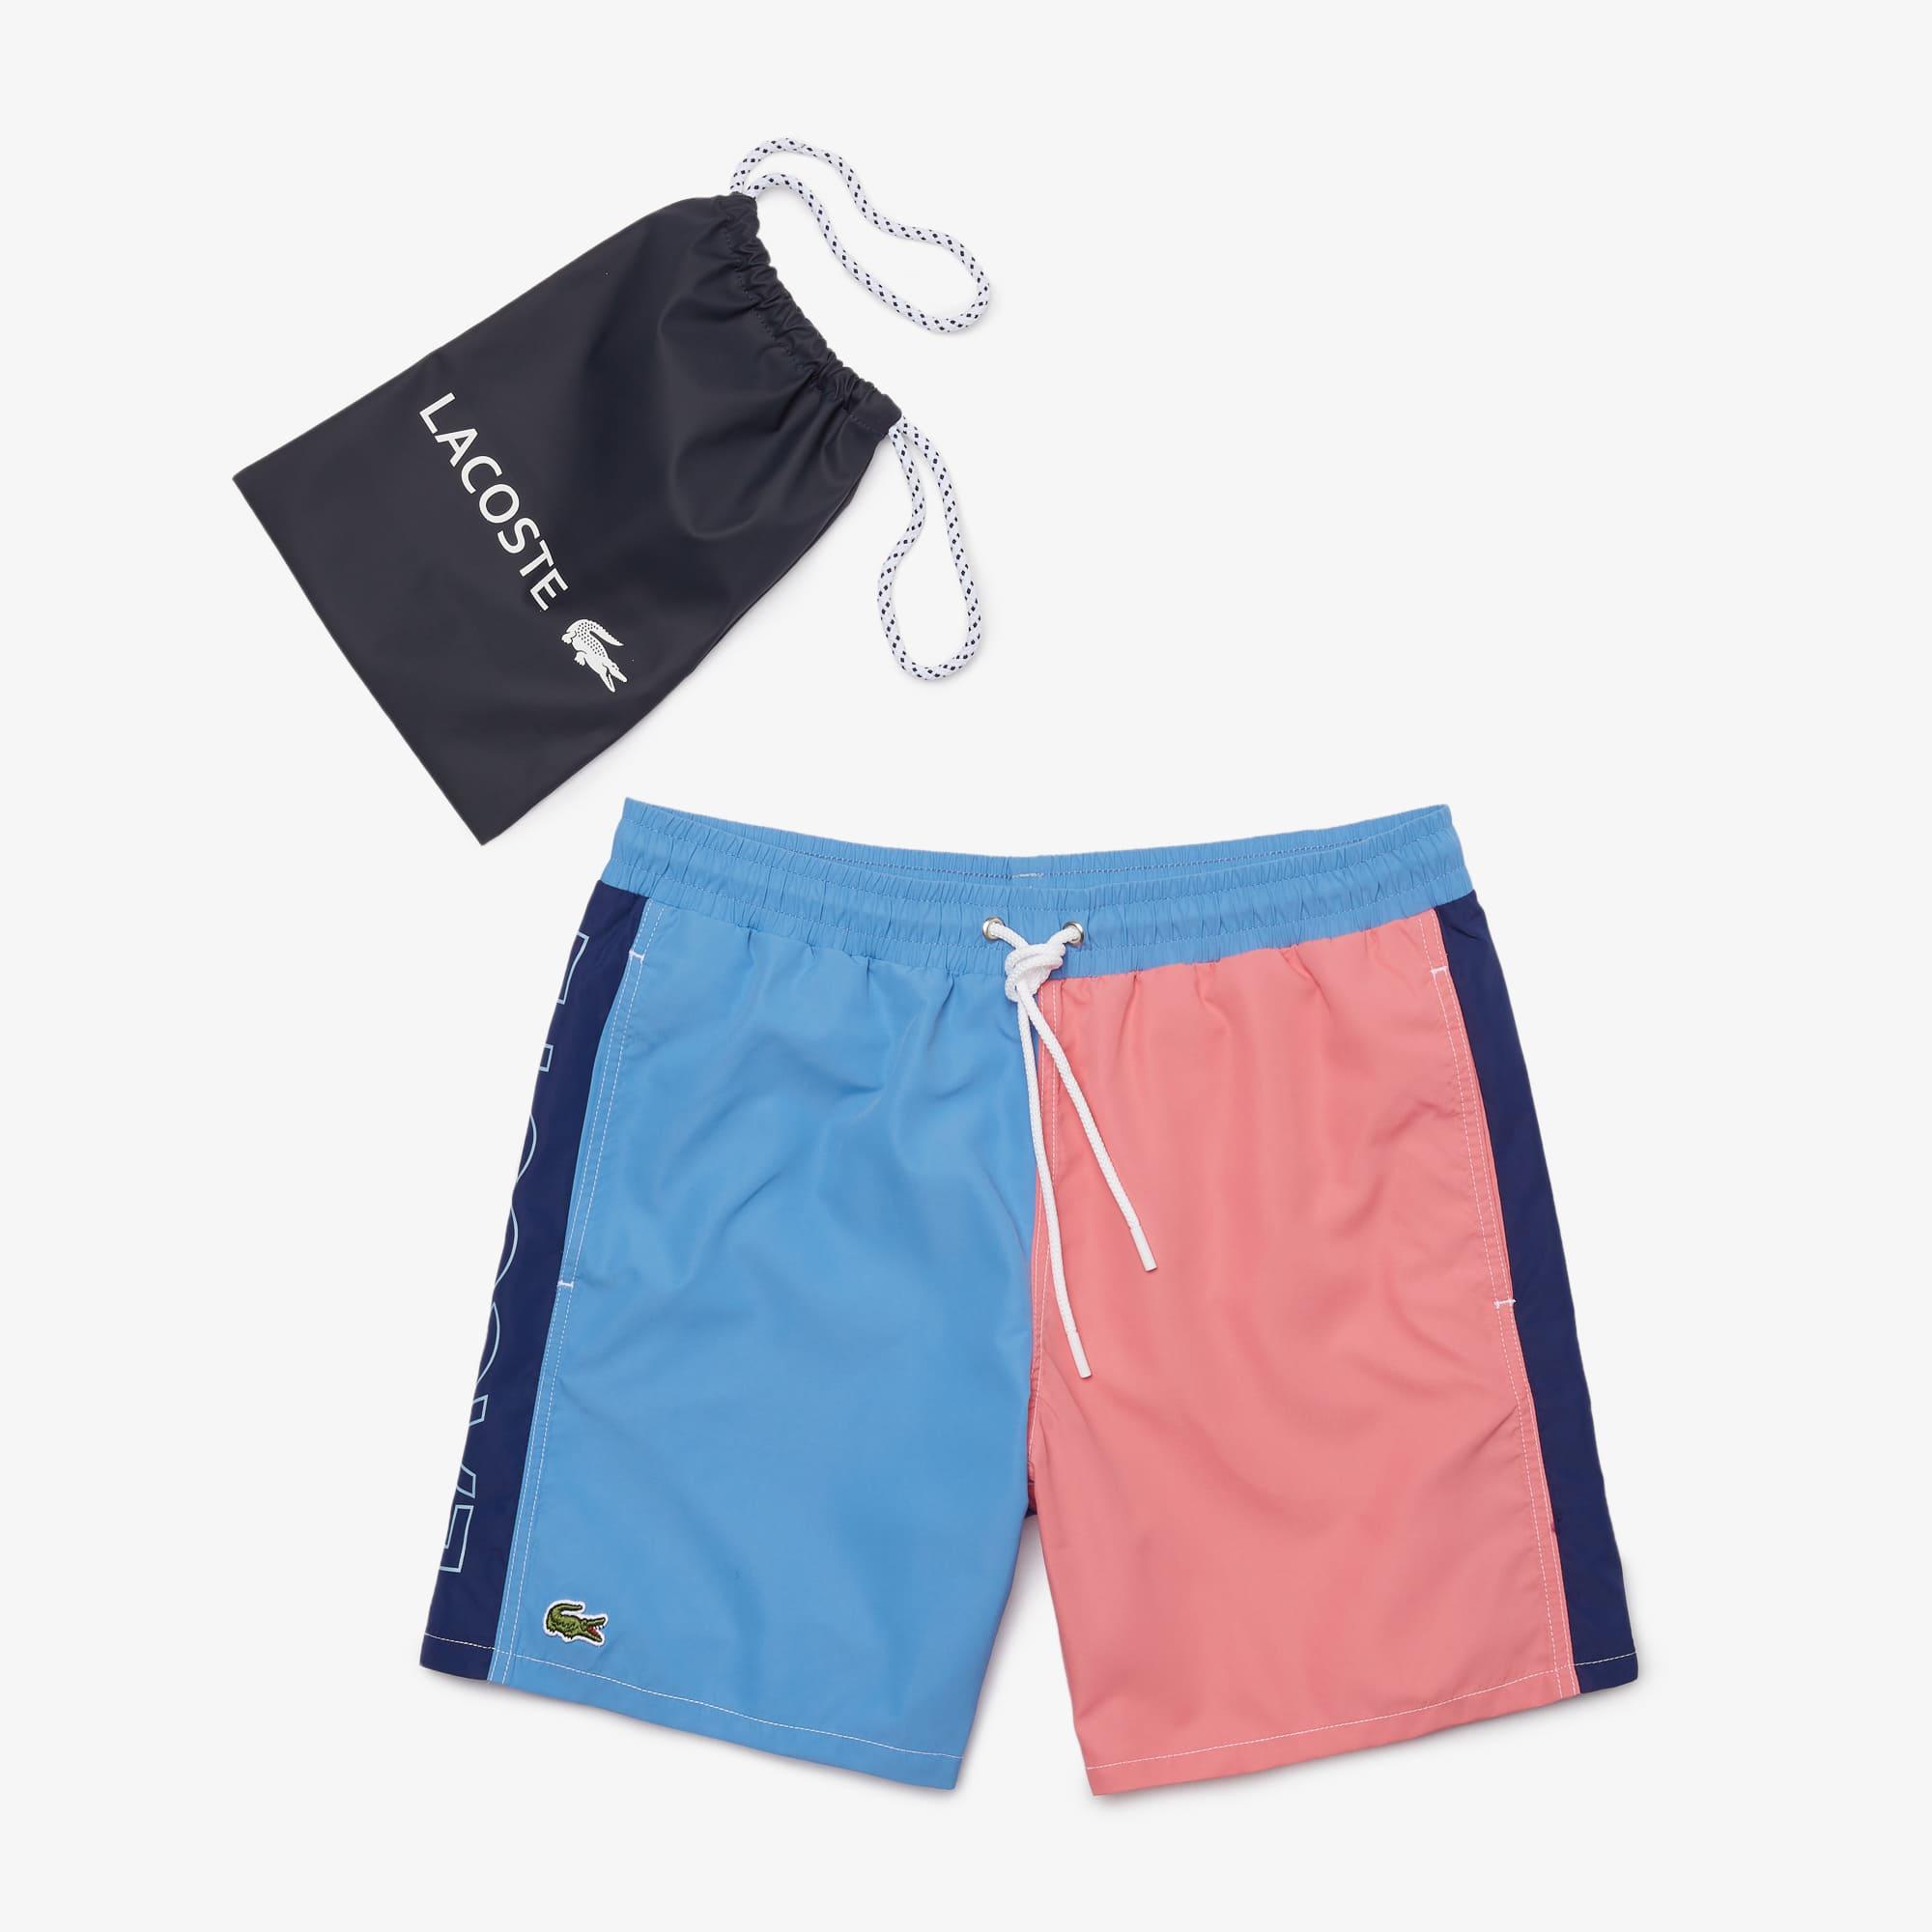 Lacoste Mh5530 Colourblock Swimming trunks Blue//Orange//Yellow 876